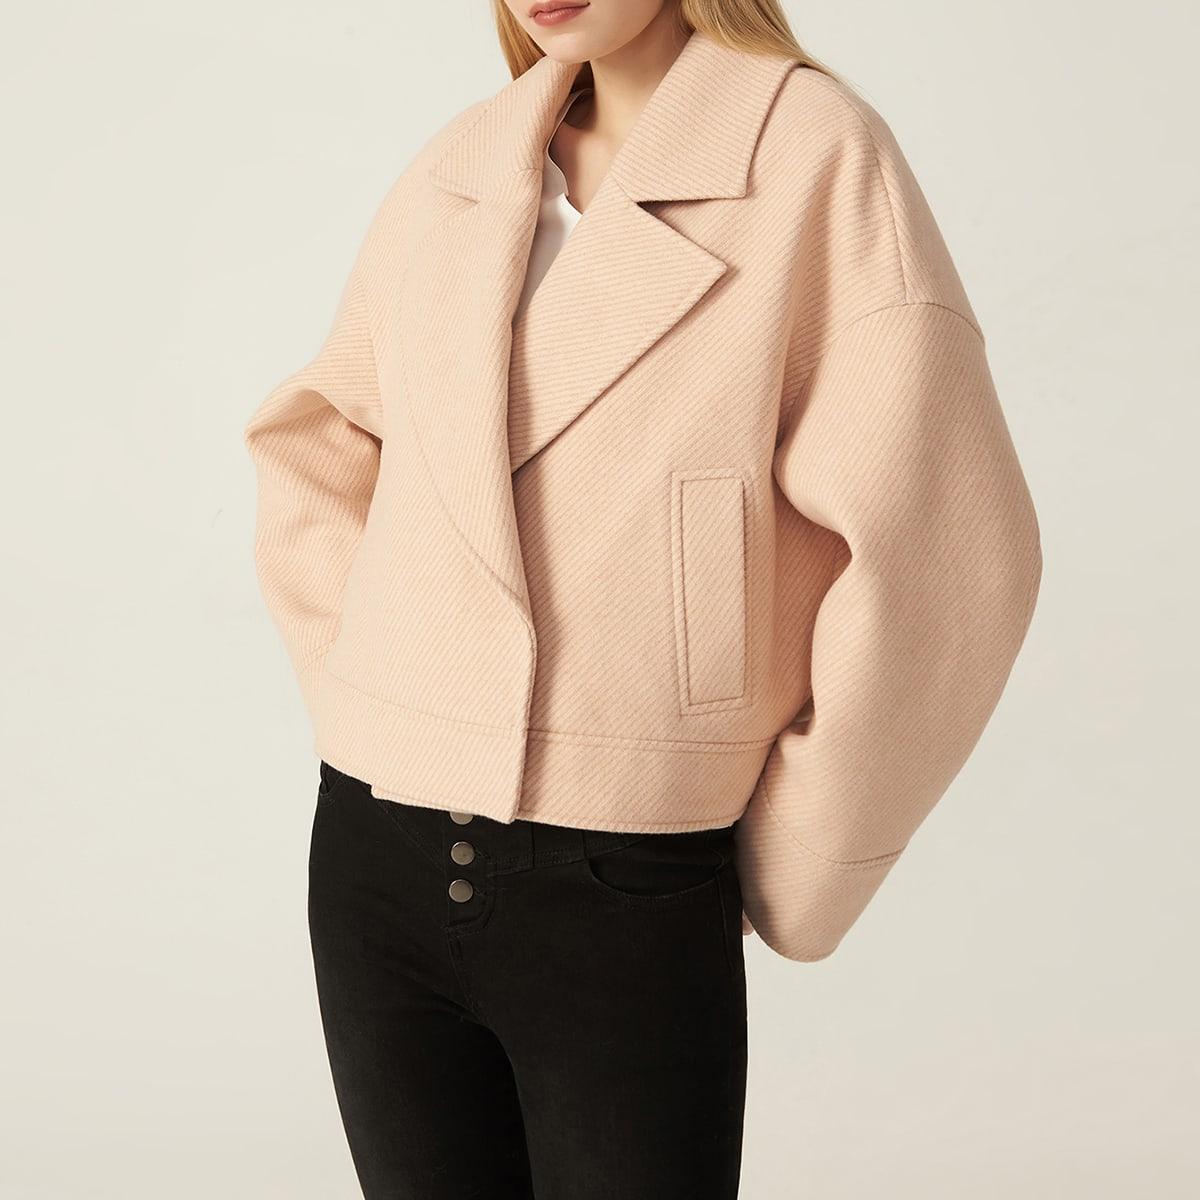 Кроп пиджак оверсайз из твила от SHEIN